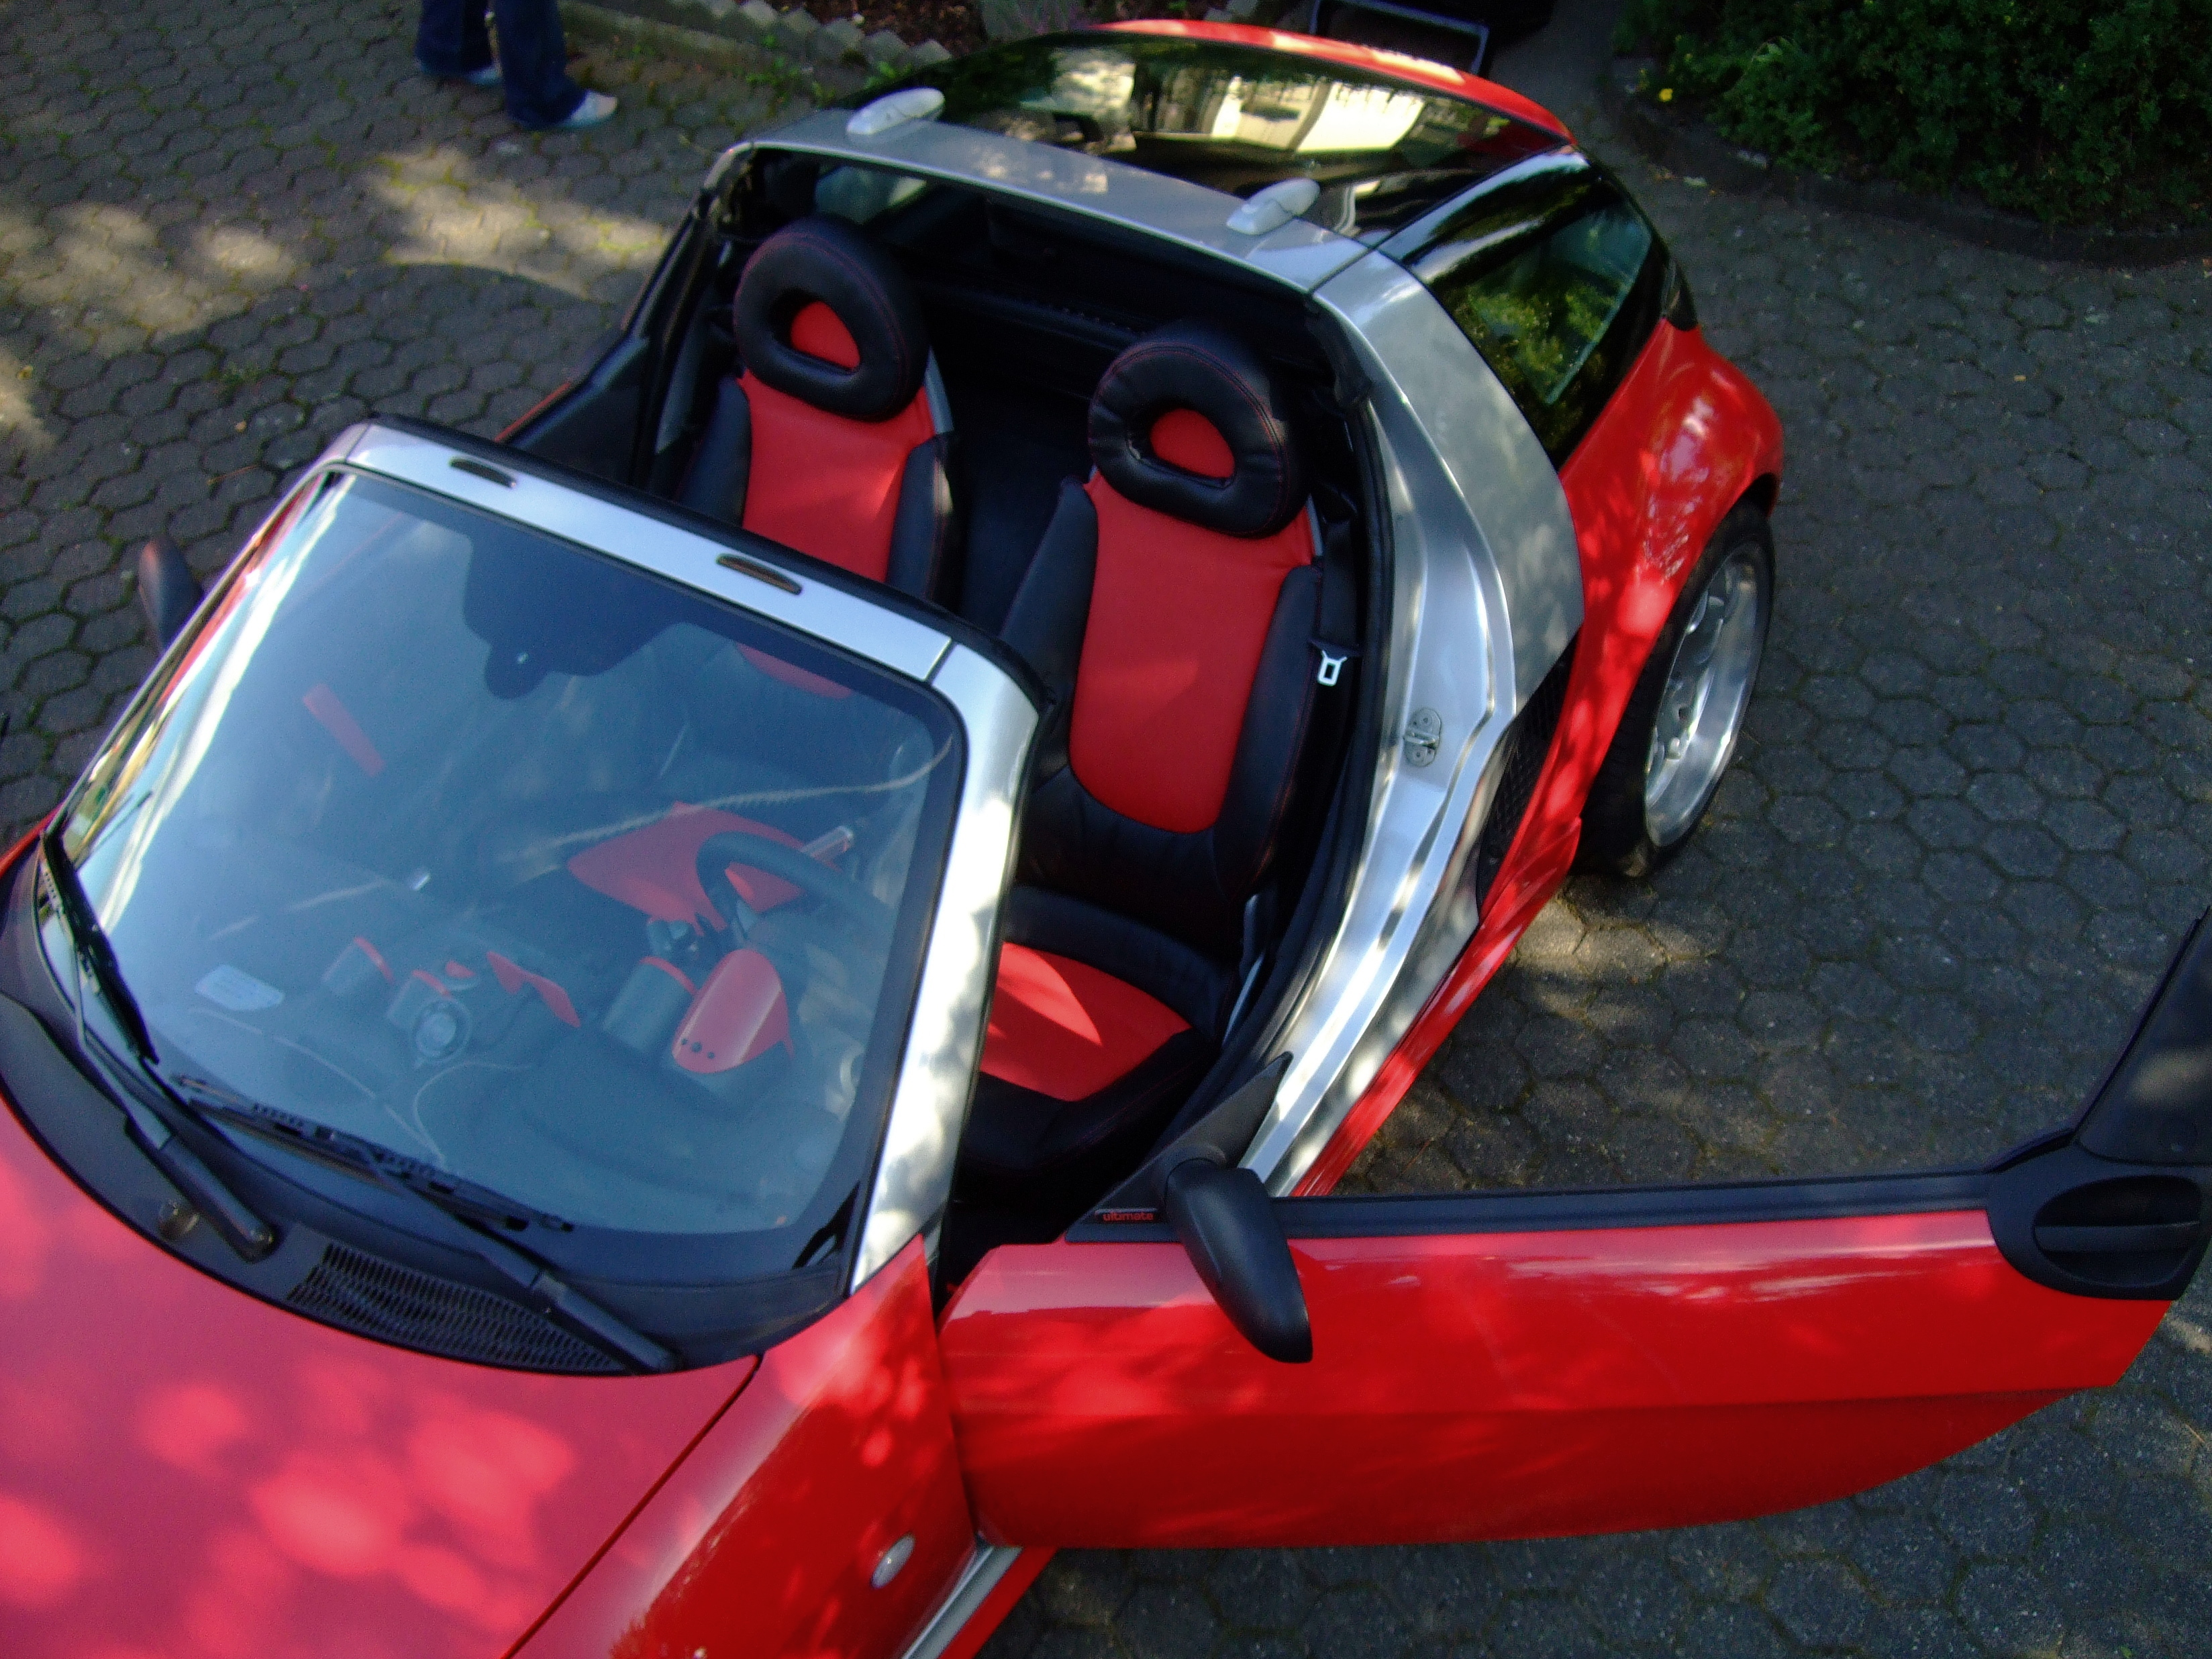 auto mcc smart roadster brabus ultimate coupe nr 57. Black Bedroom Furniture Sets. Home Design Ideas